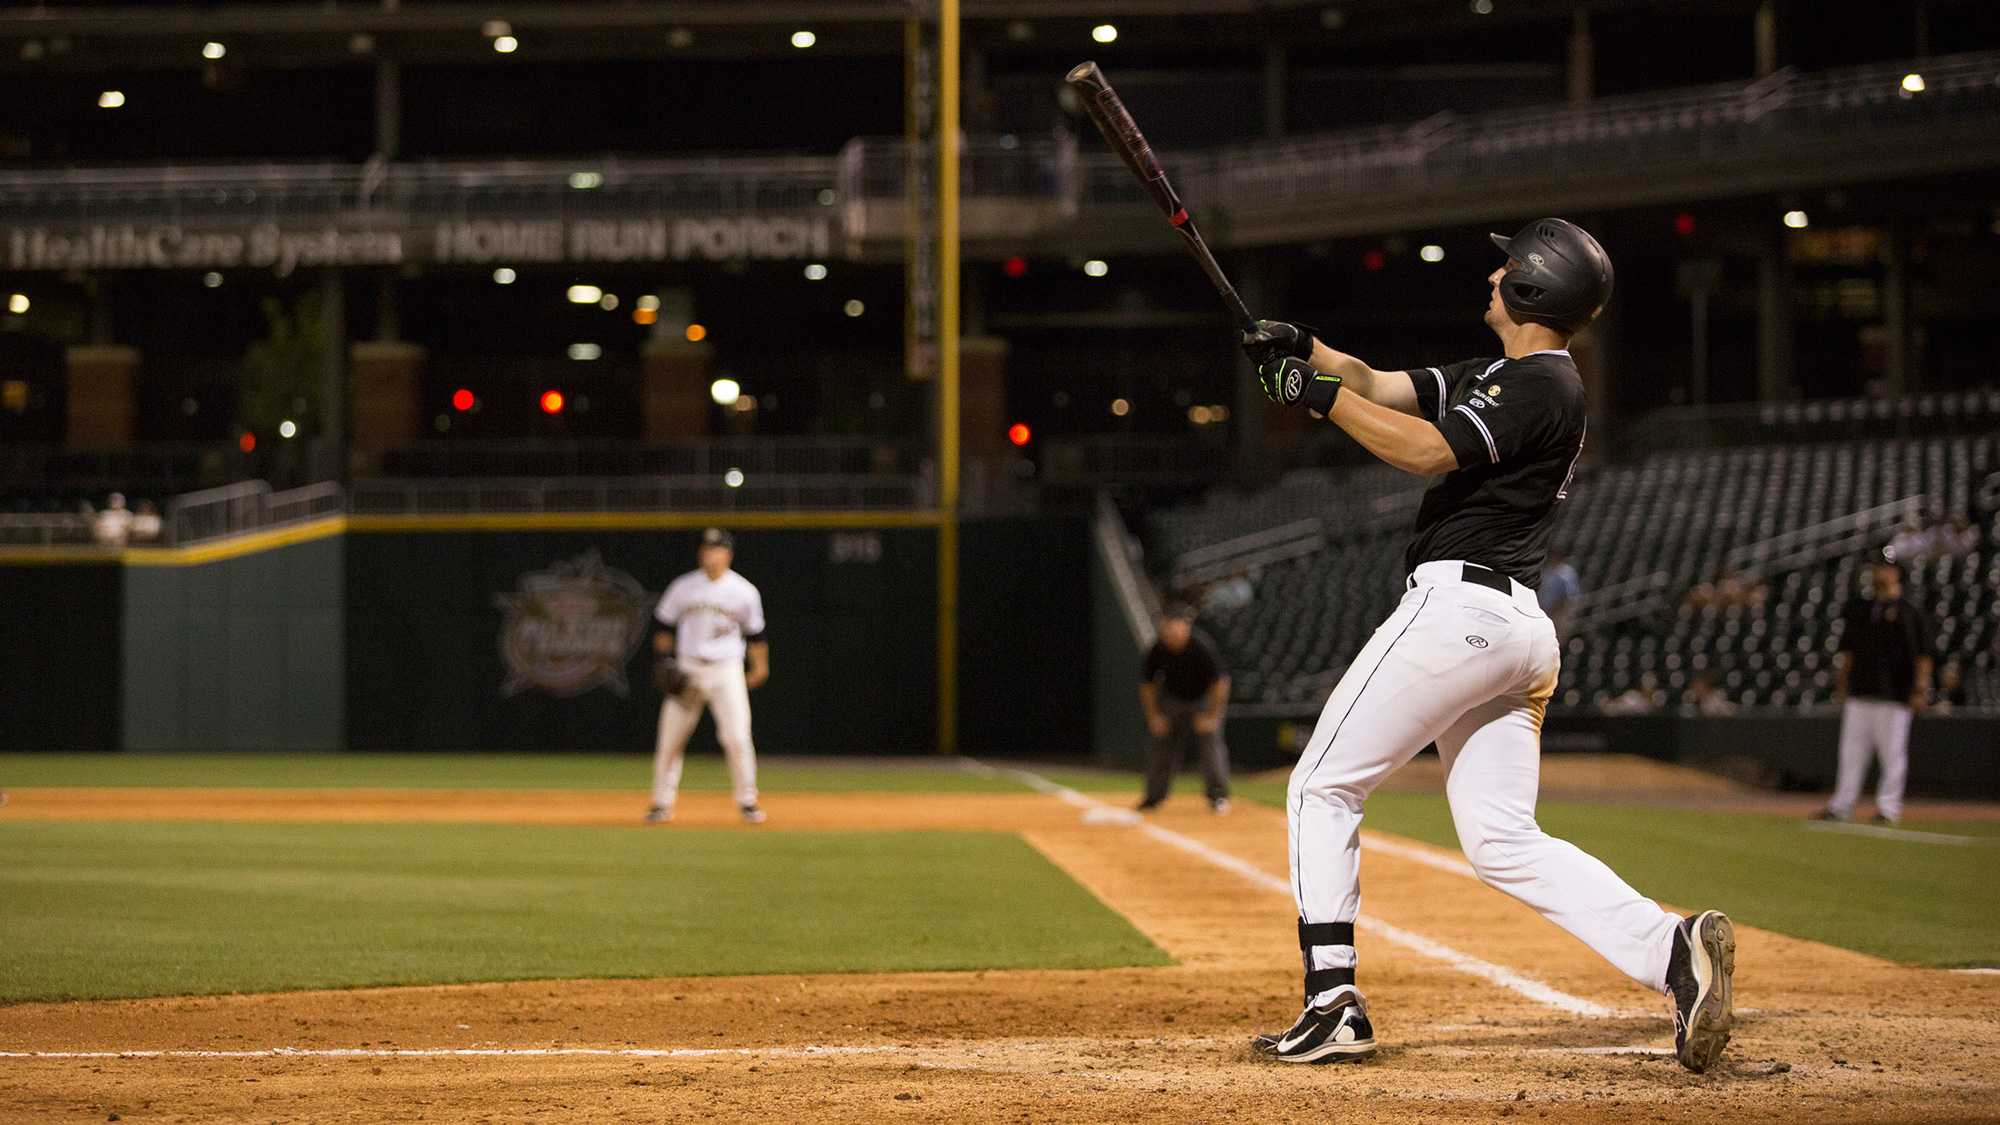 Senior infielder Grayson Atwood follows through his swing. Courtesy of Kelsey Sharkey; App State athletics